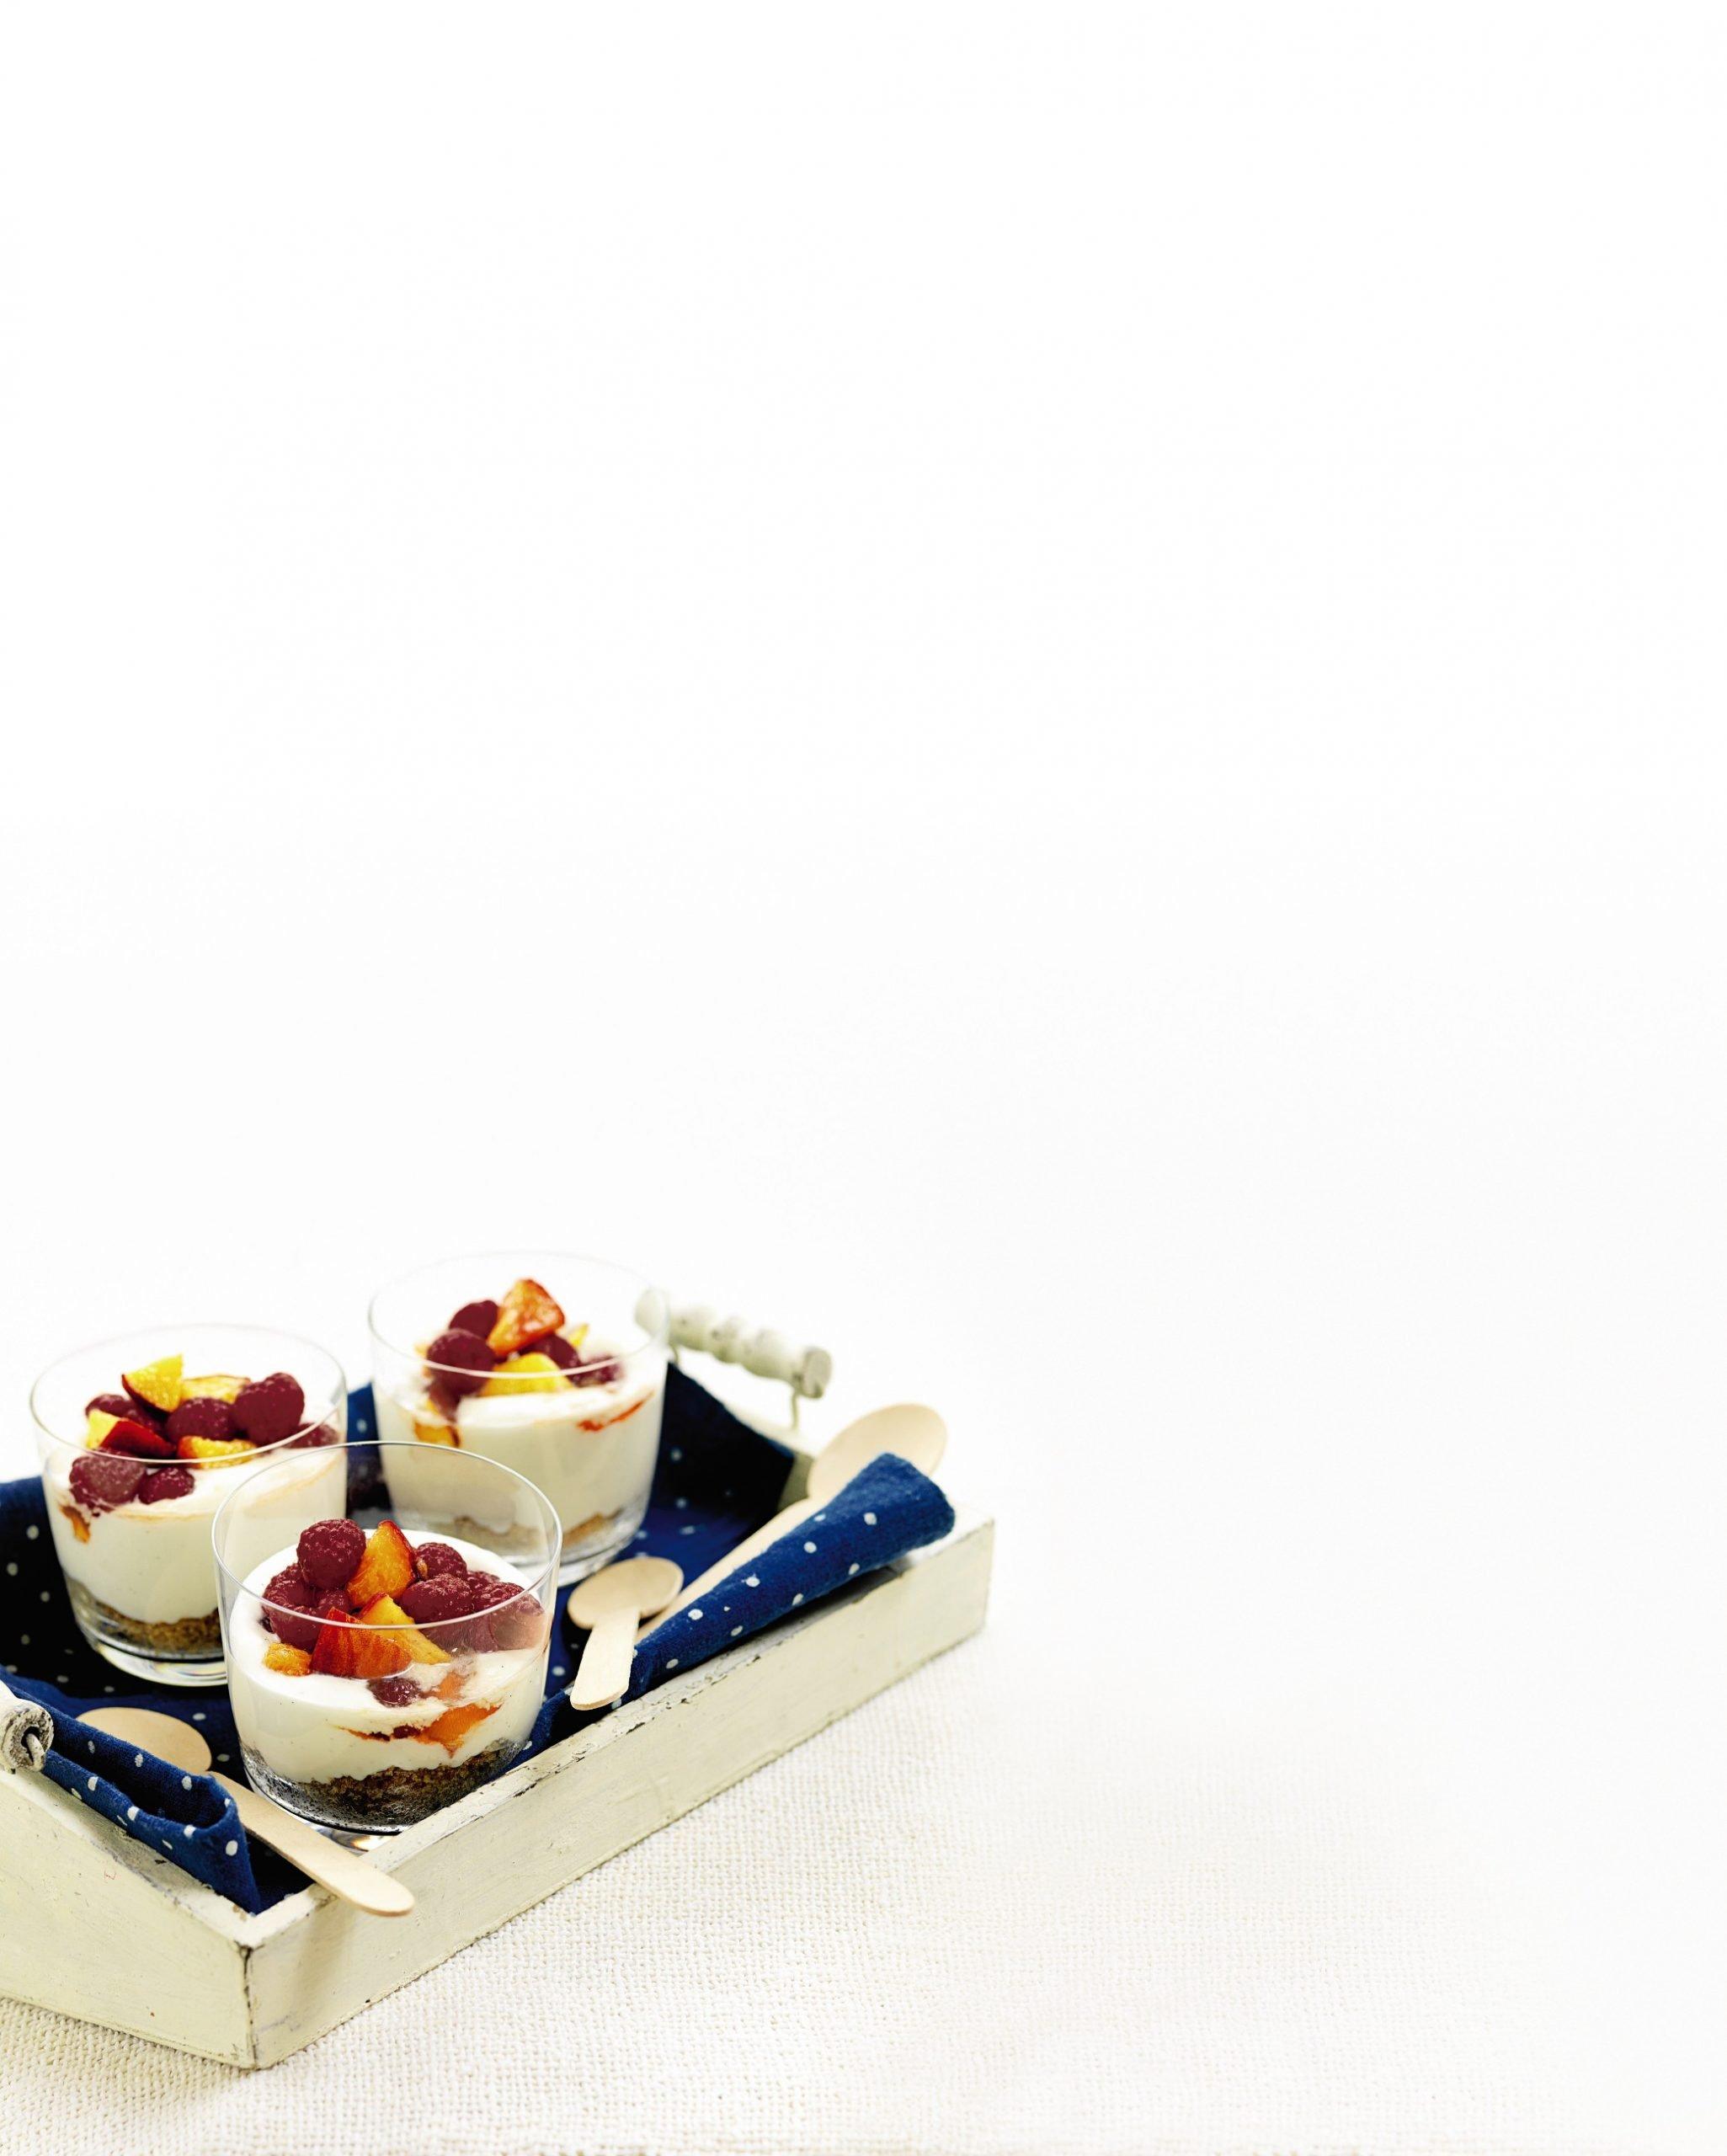 Recipe: Peach Melba Cheesecakes